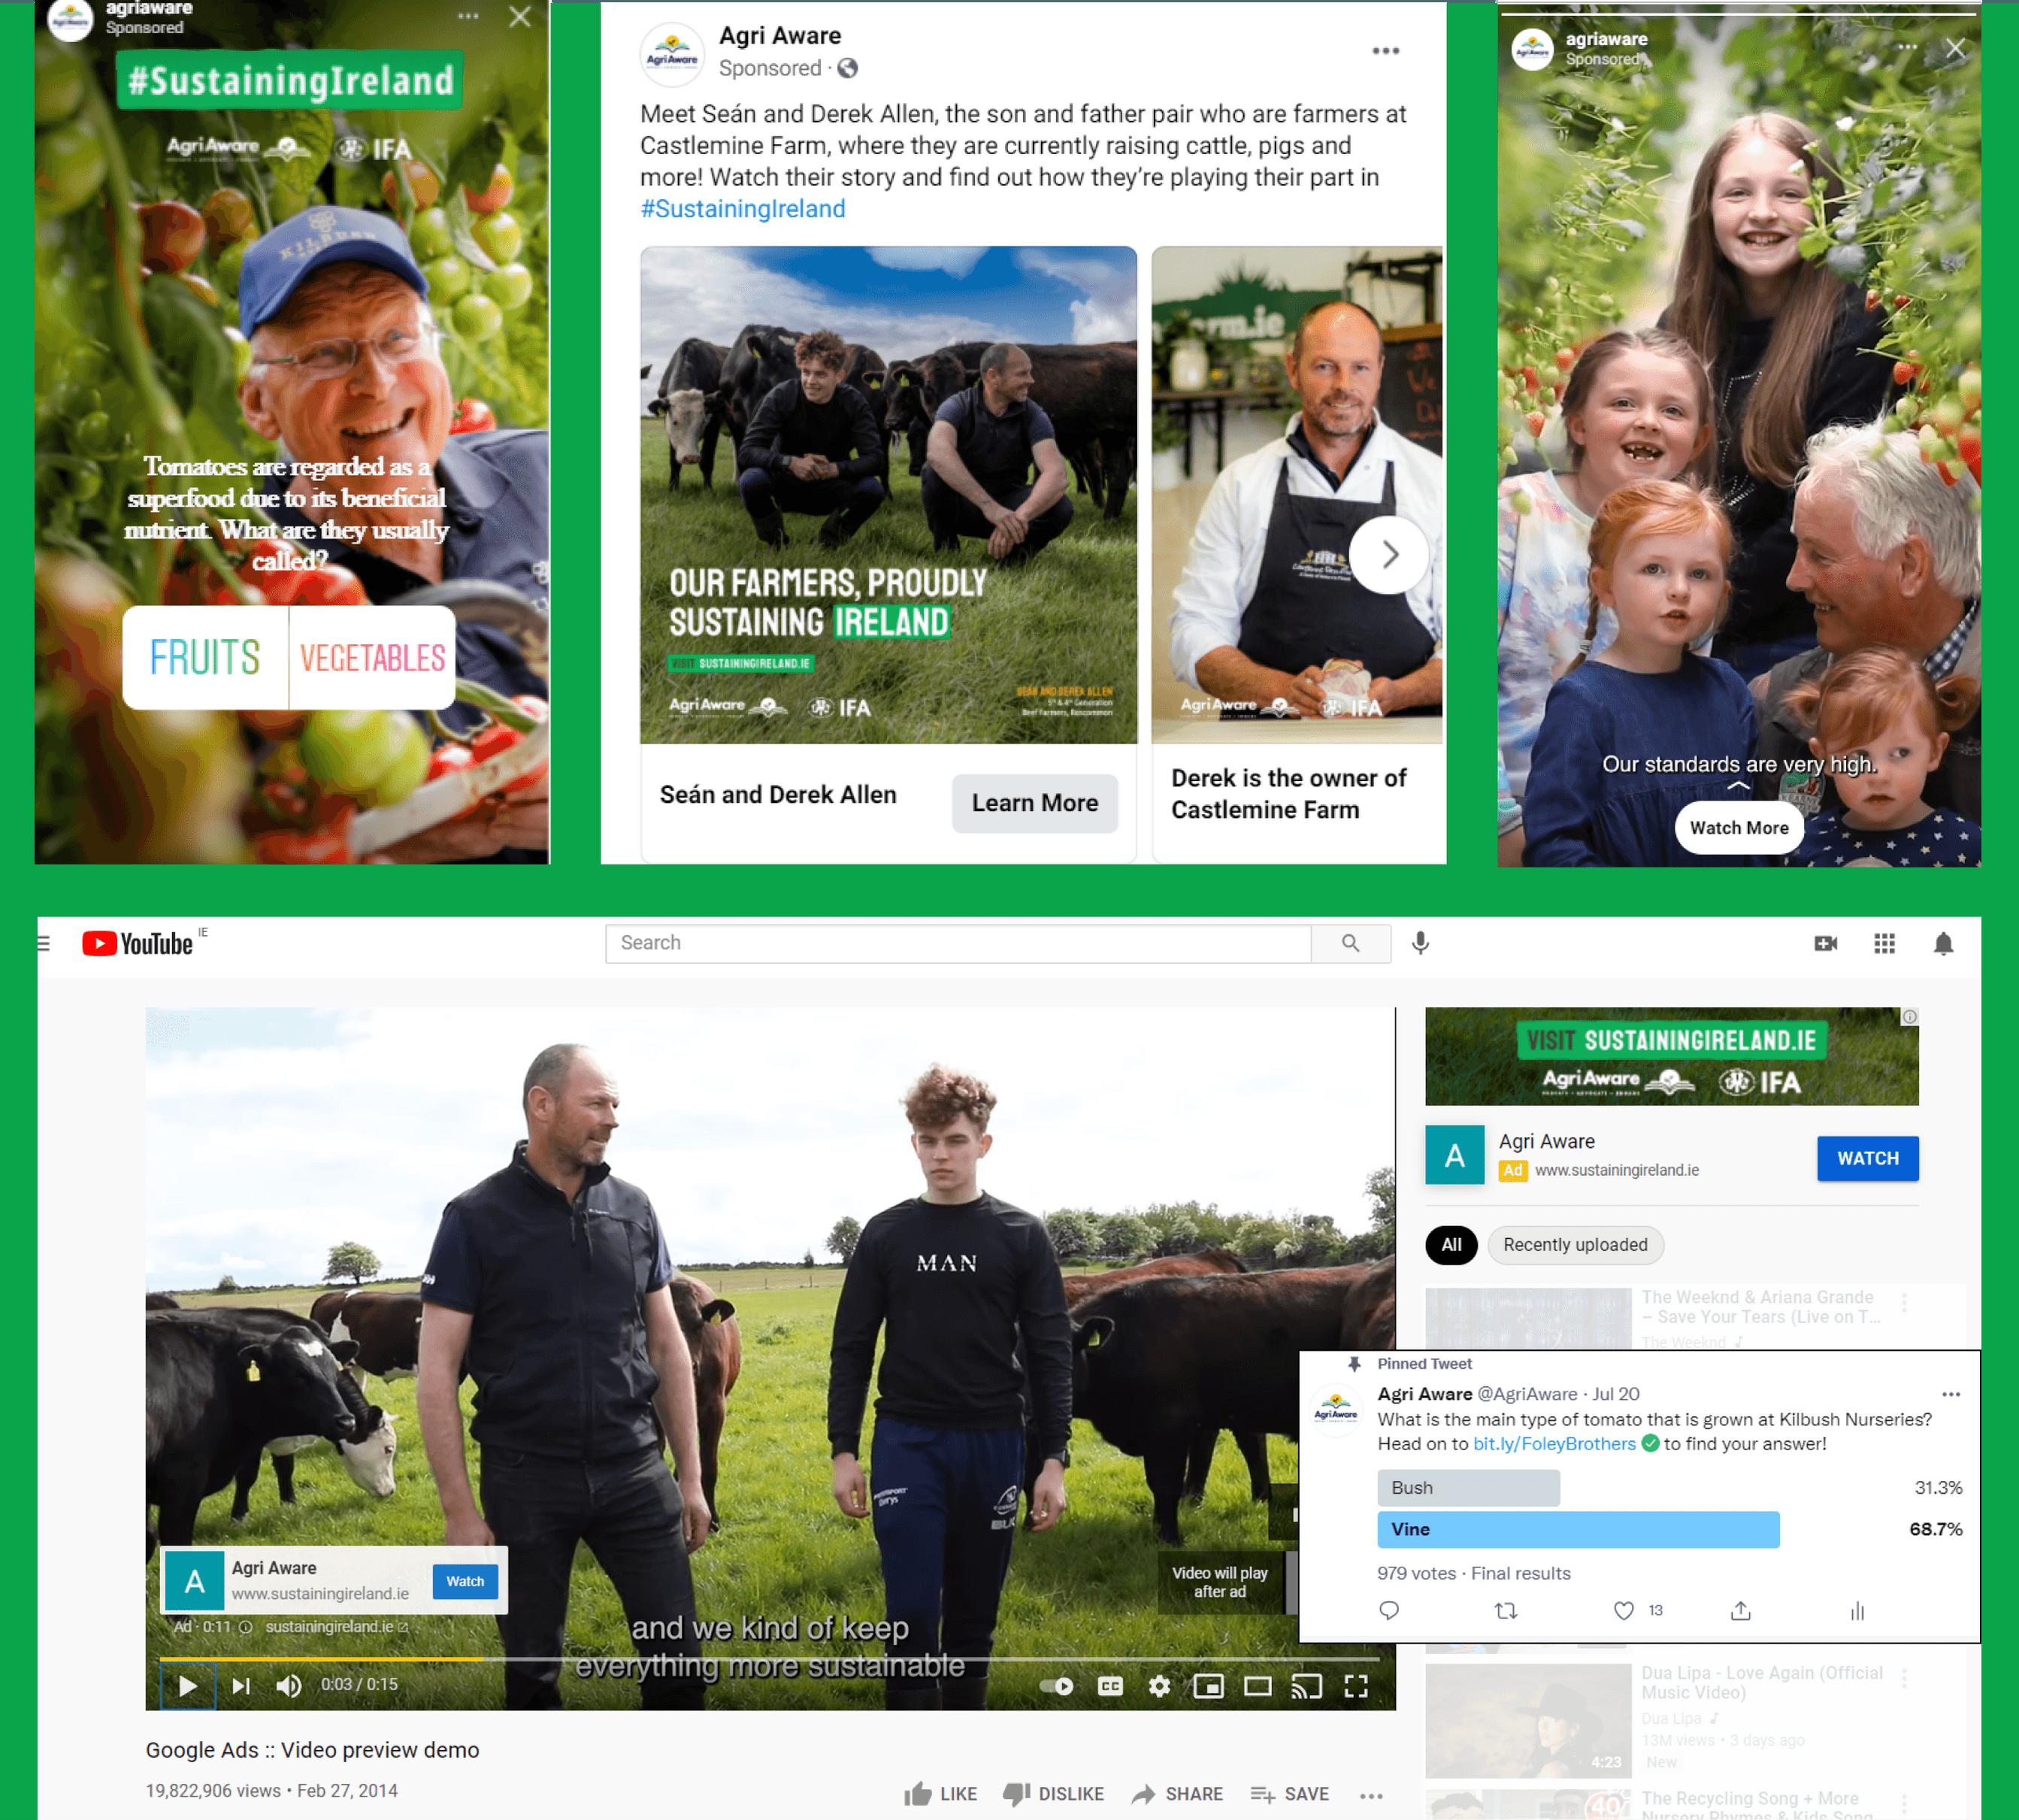 Agri Aware Social Media Campaign